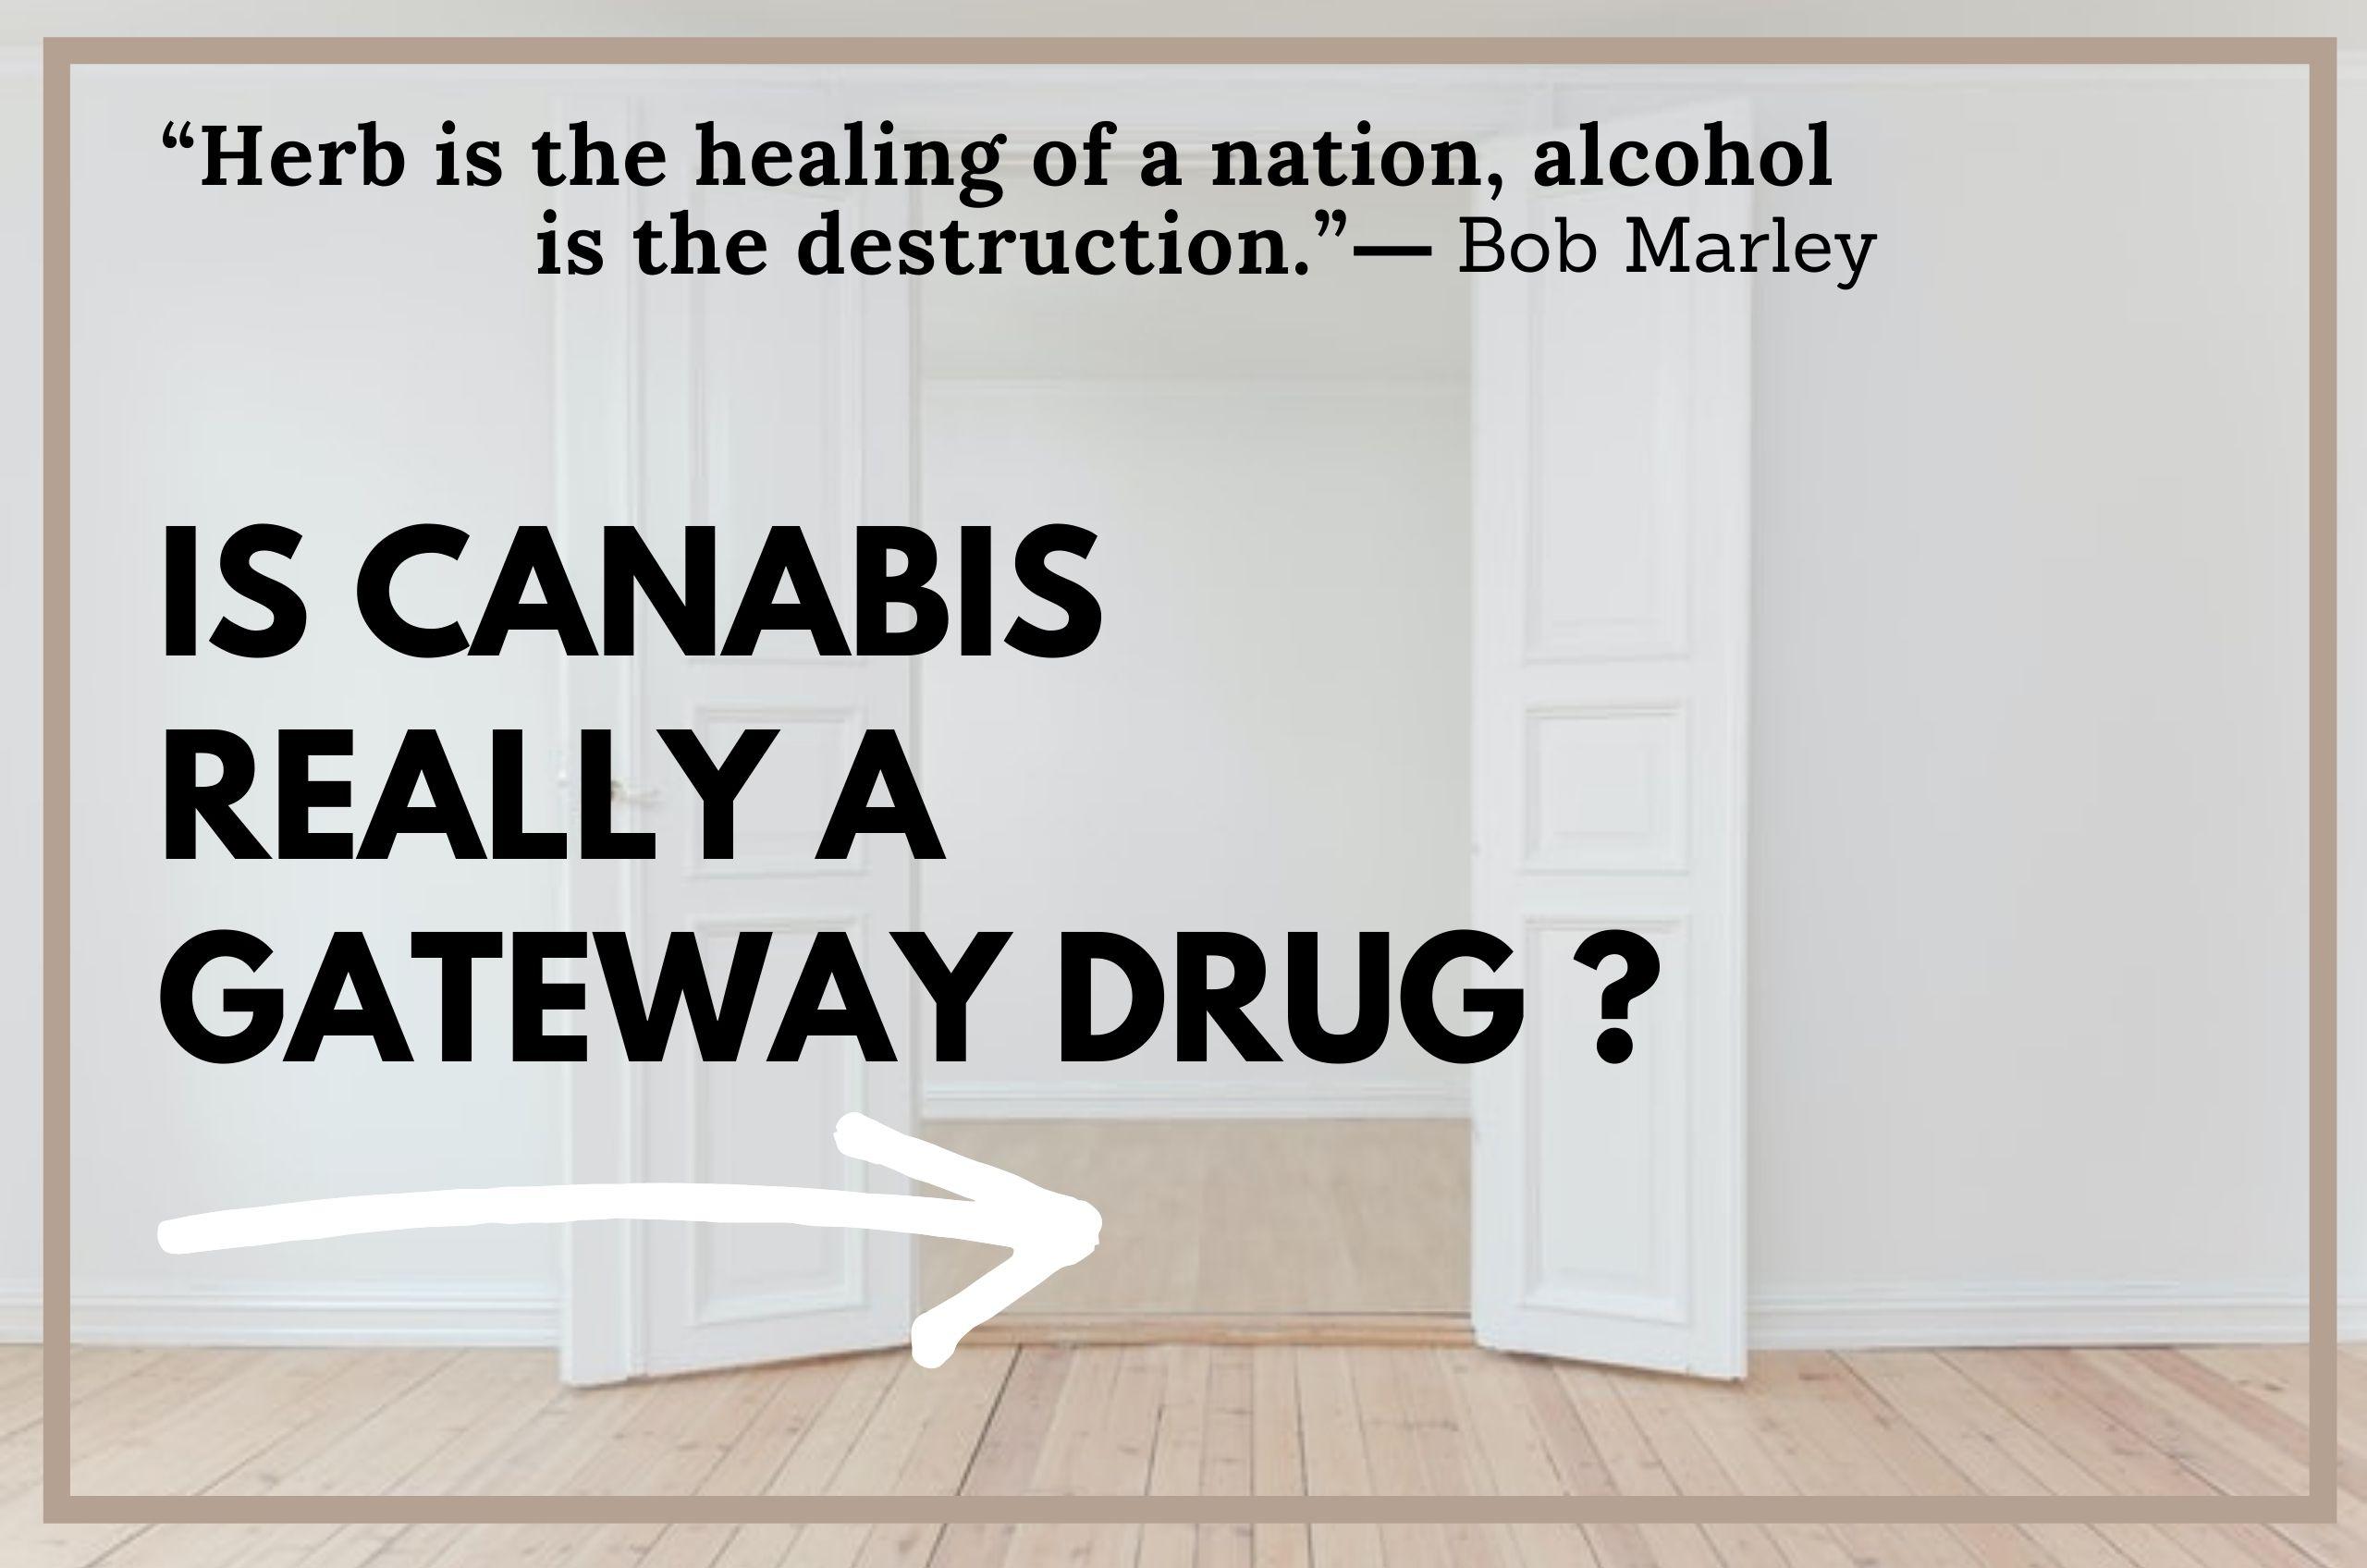 What's the Reality of Marijuana's Gateway Drug Theory?